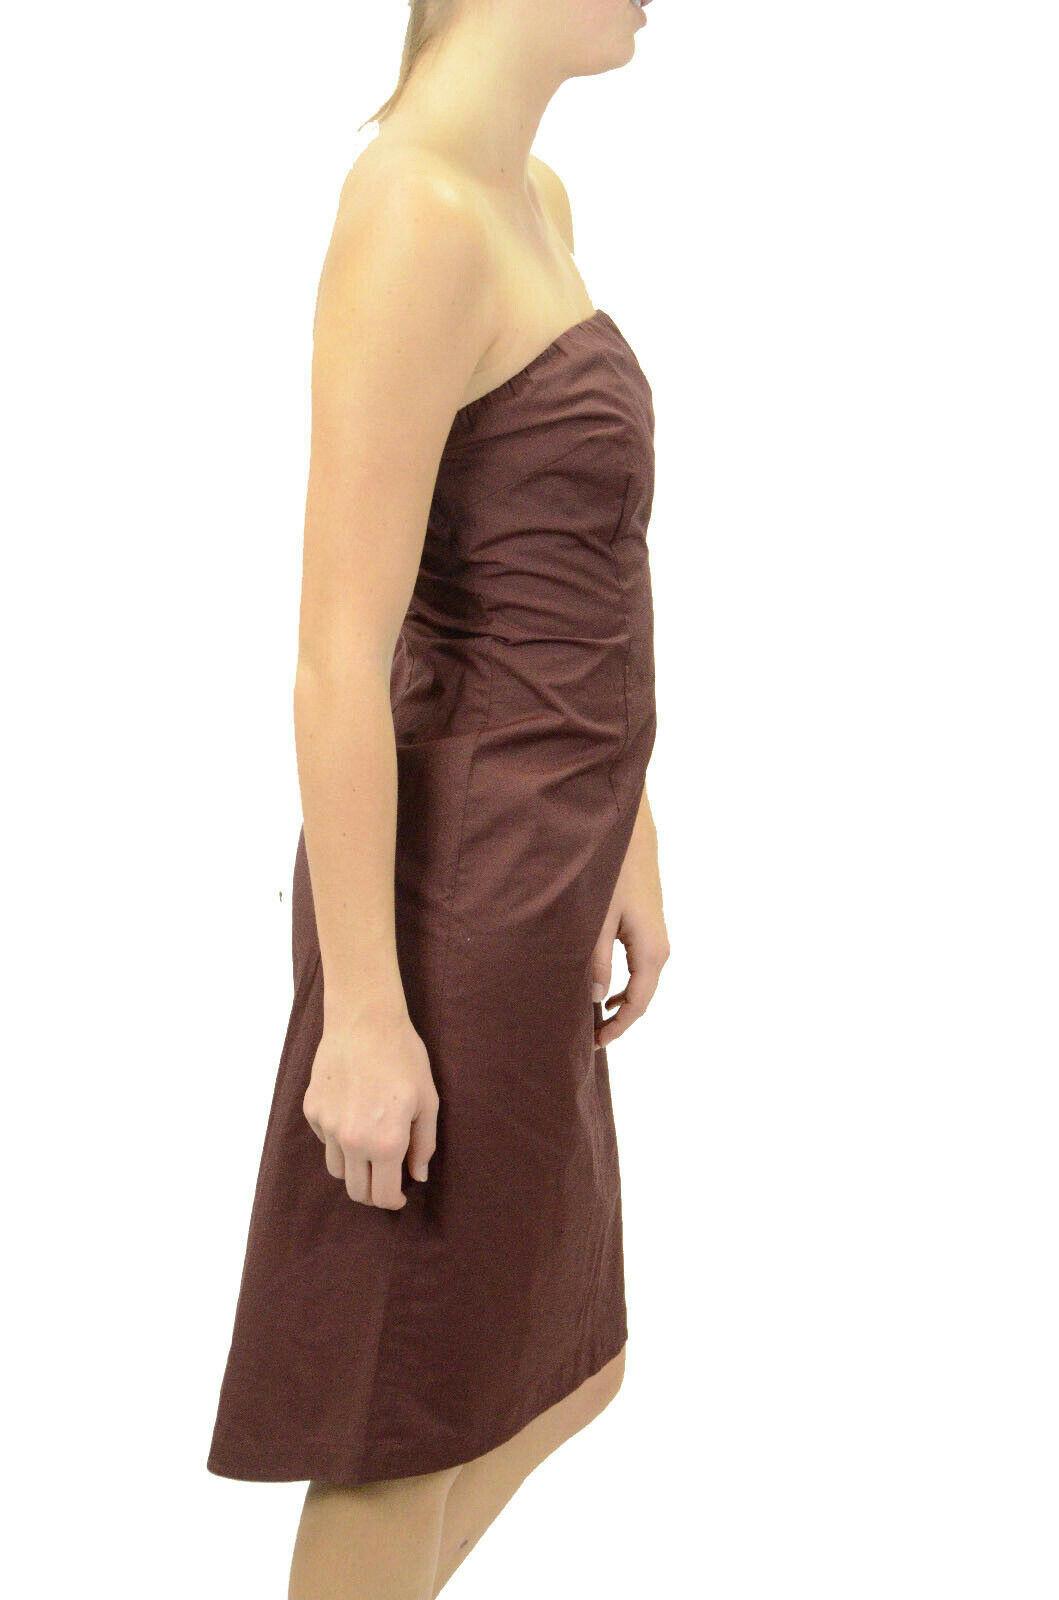 Size 8 J Crew Burgundy/Brown Strapless Sheath Dress Elastic Back Knee Length EUC image 3